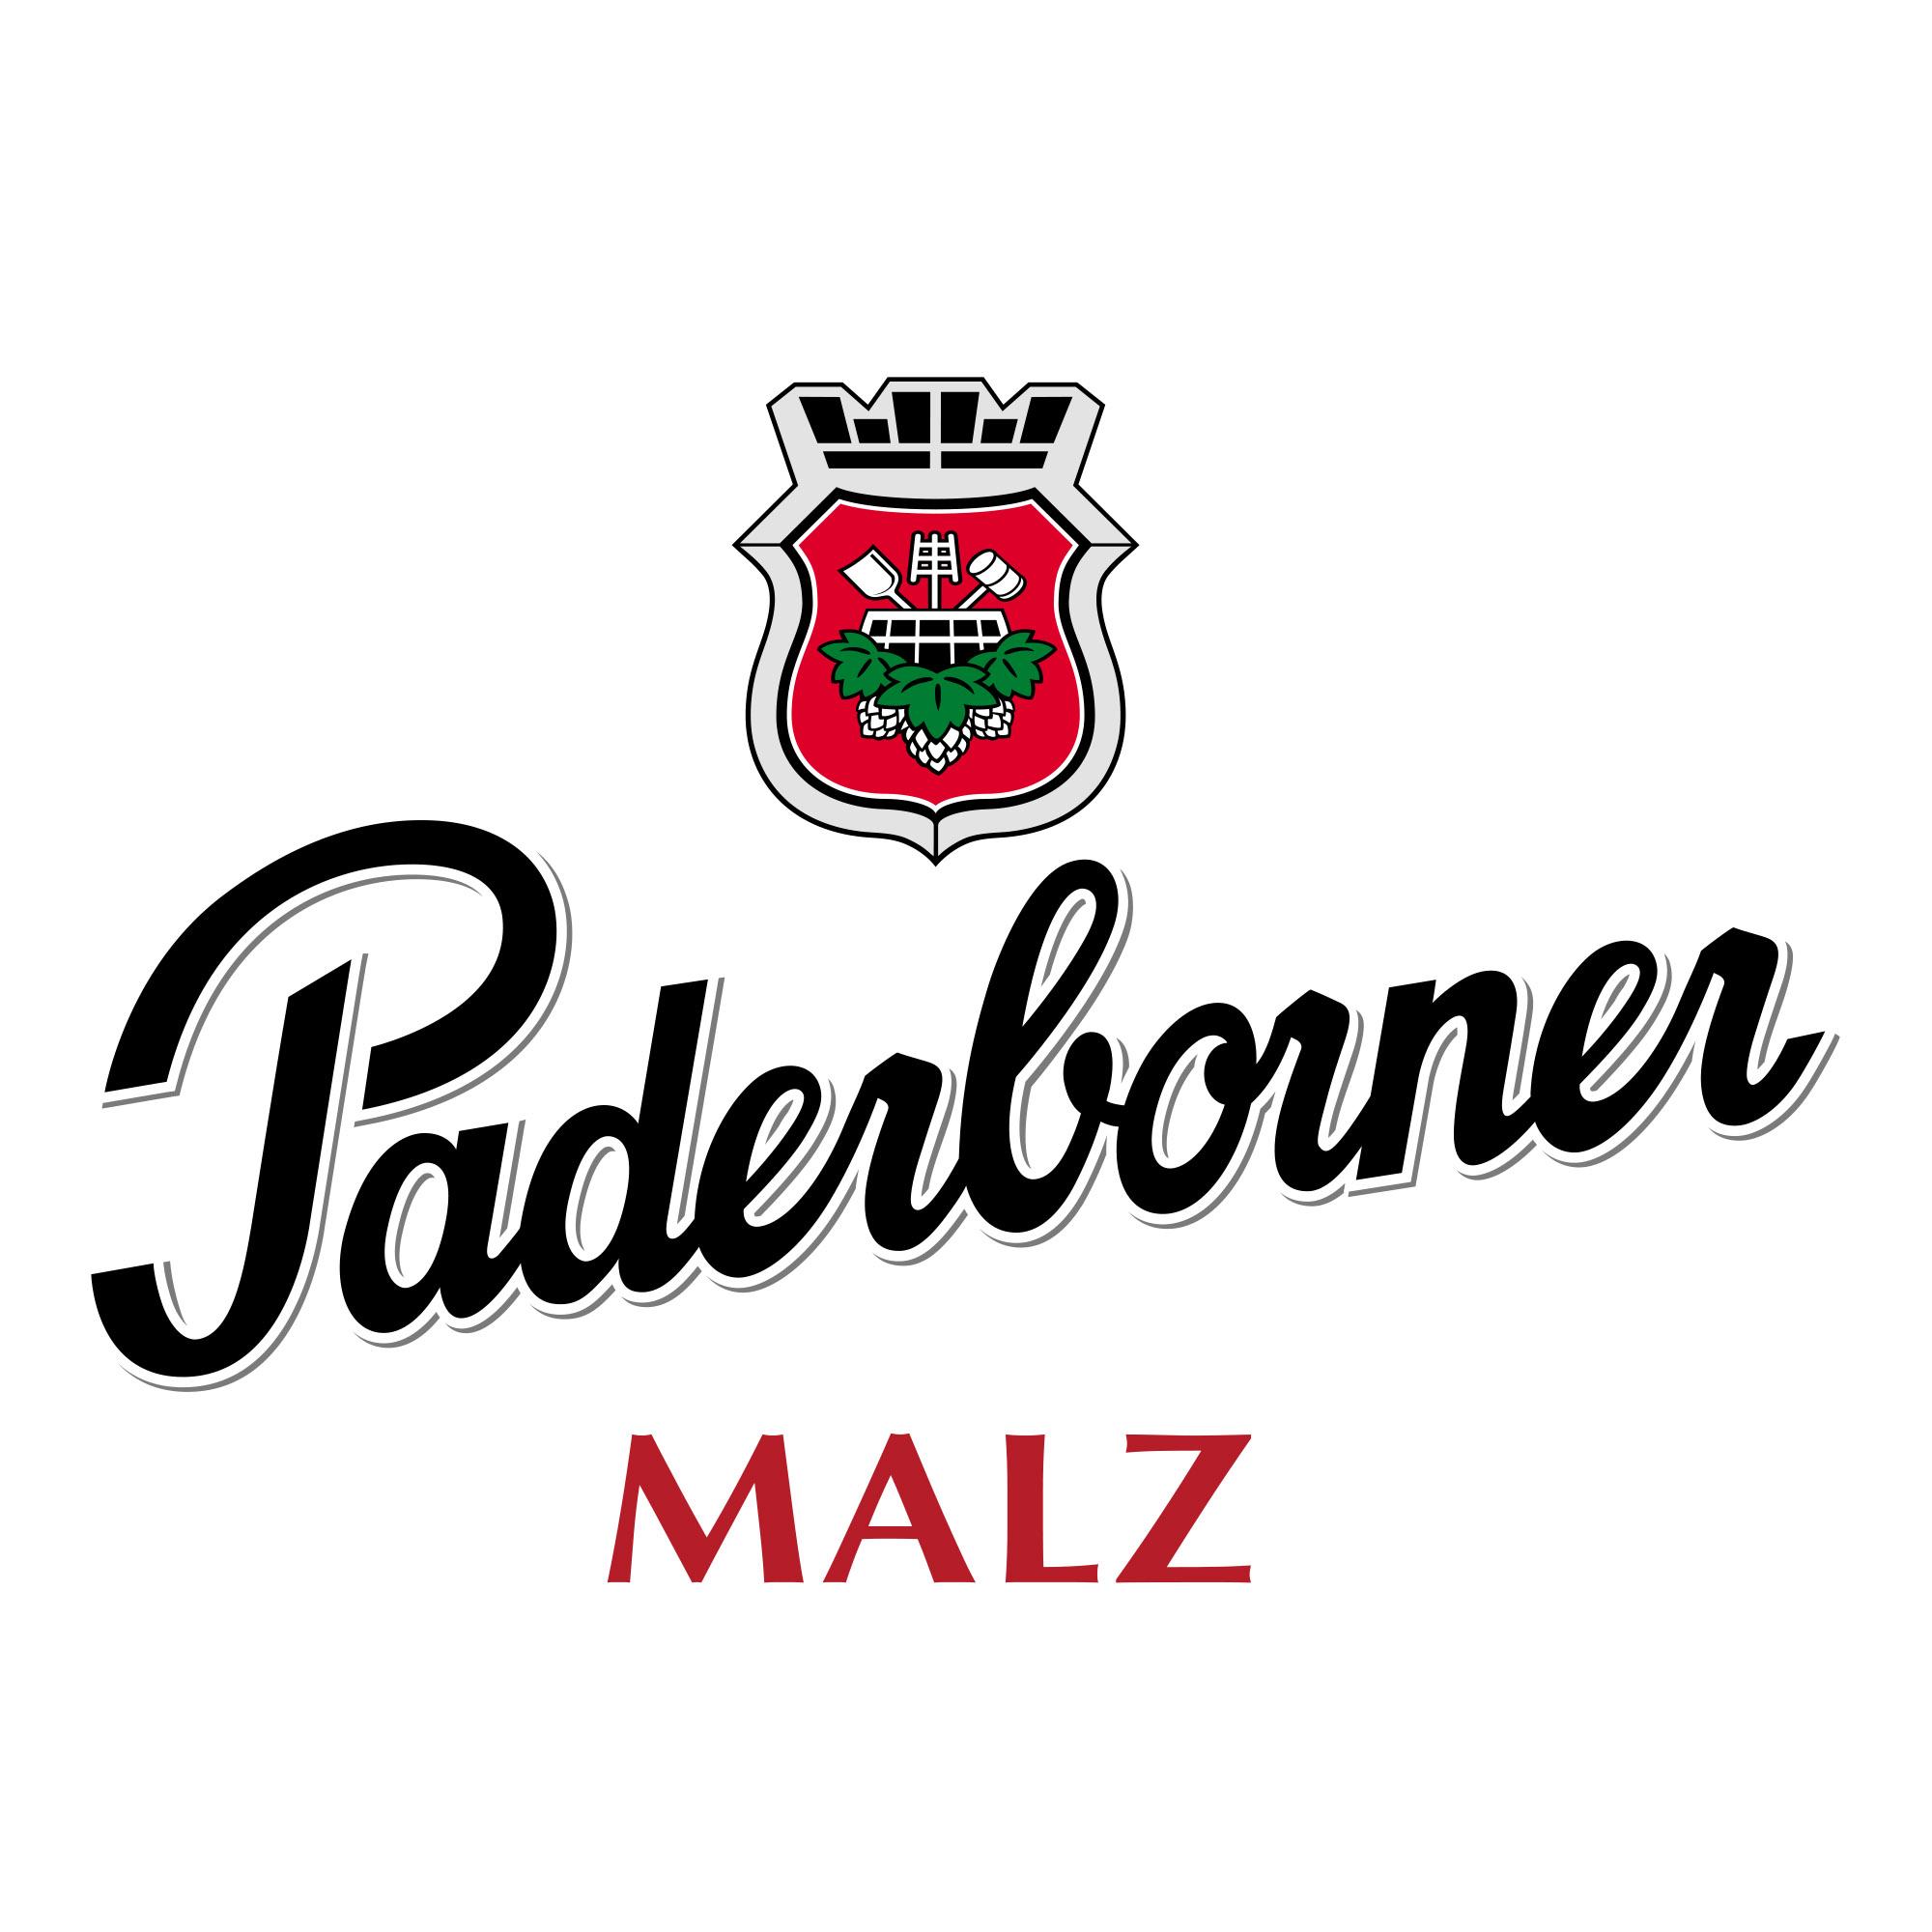 Logo Paderborner Malz